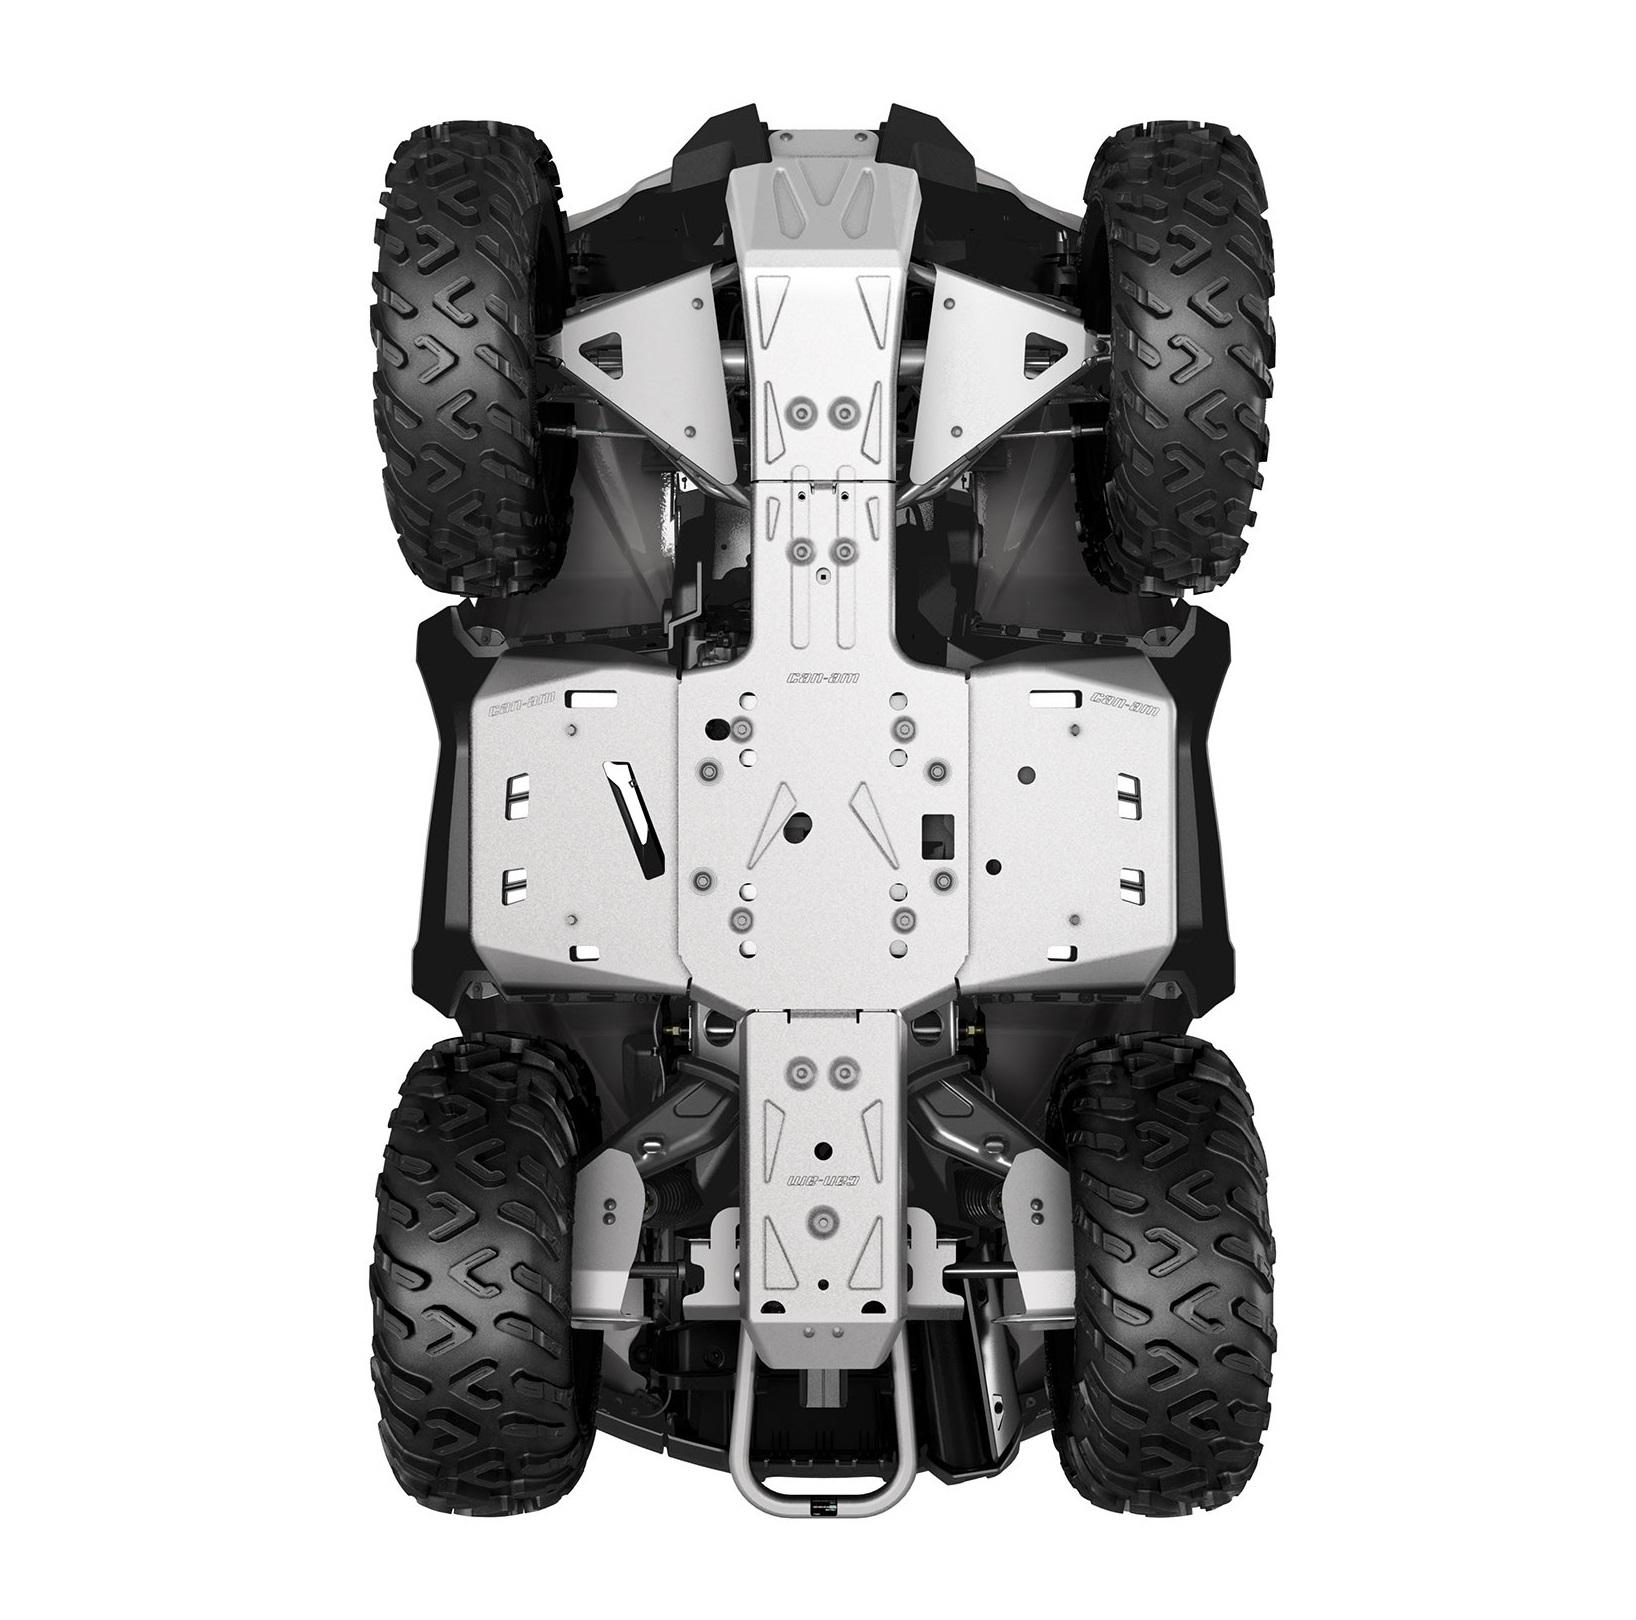 ALUMINUM SKID PLATE KIT, G2 (2019 a novší) (Iba modely MAX, X mr 1000R)